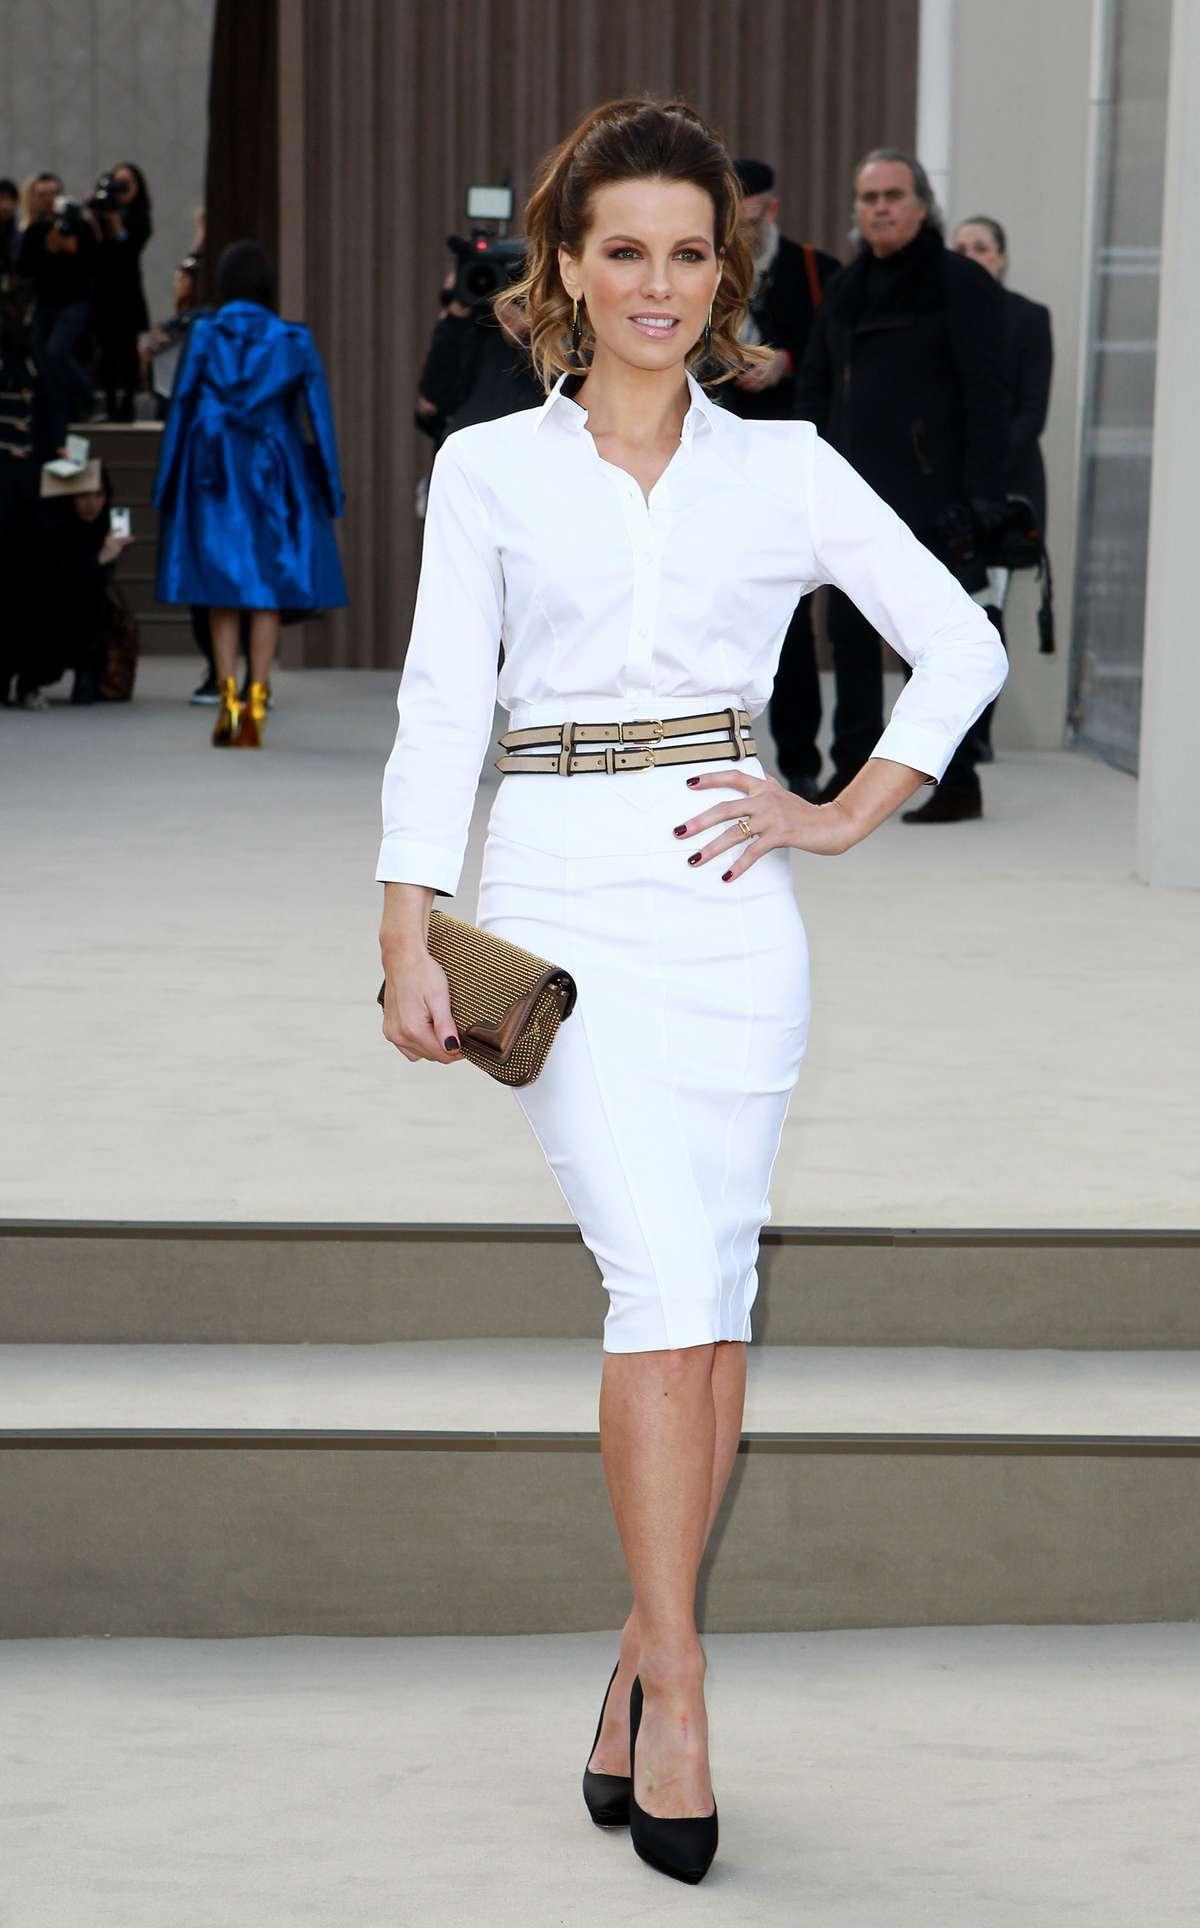 Kate Beckinsale In White Tight Skirt 17 Gotceleb